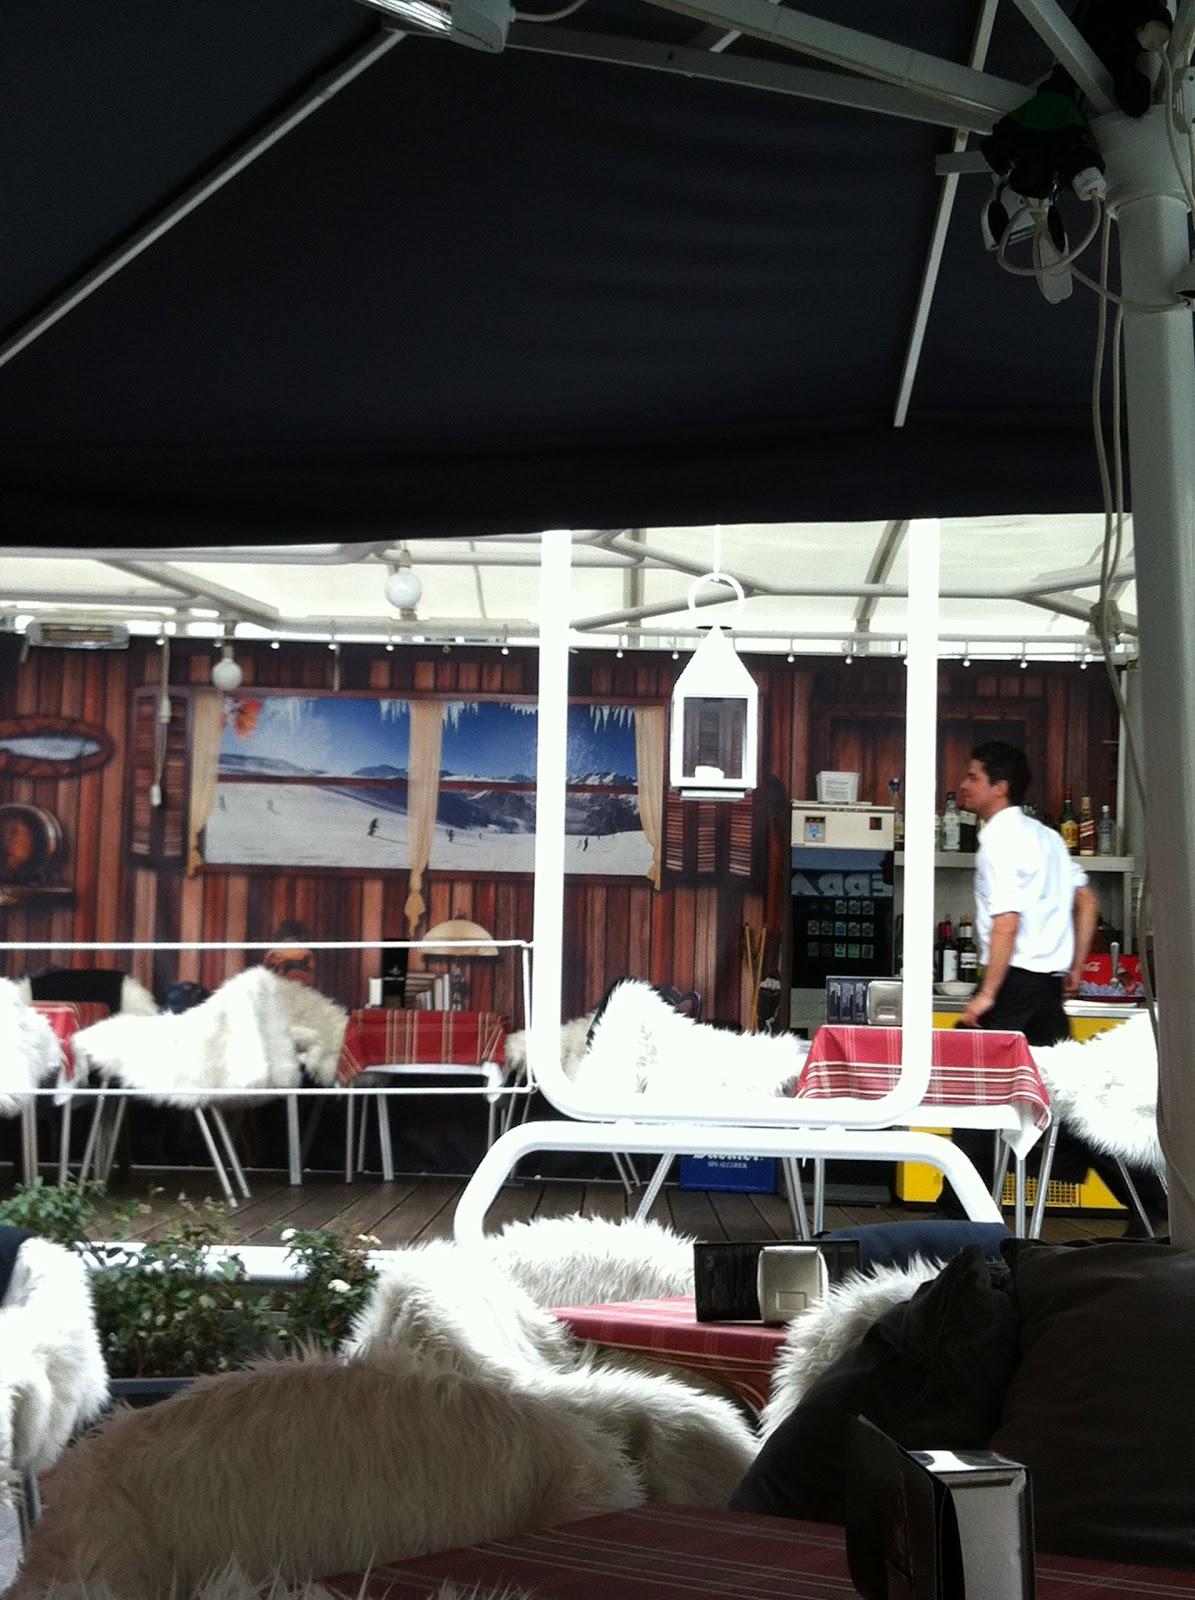 Seis Meses Antes Raclette En La Terraza De La Reina